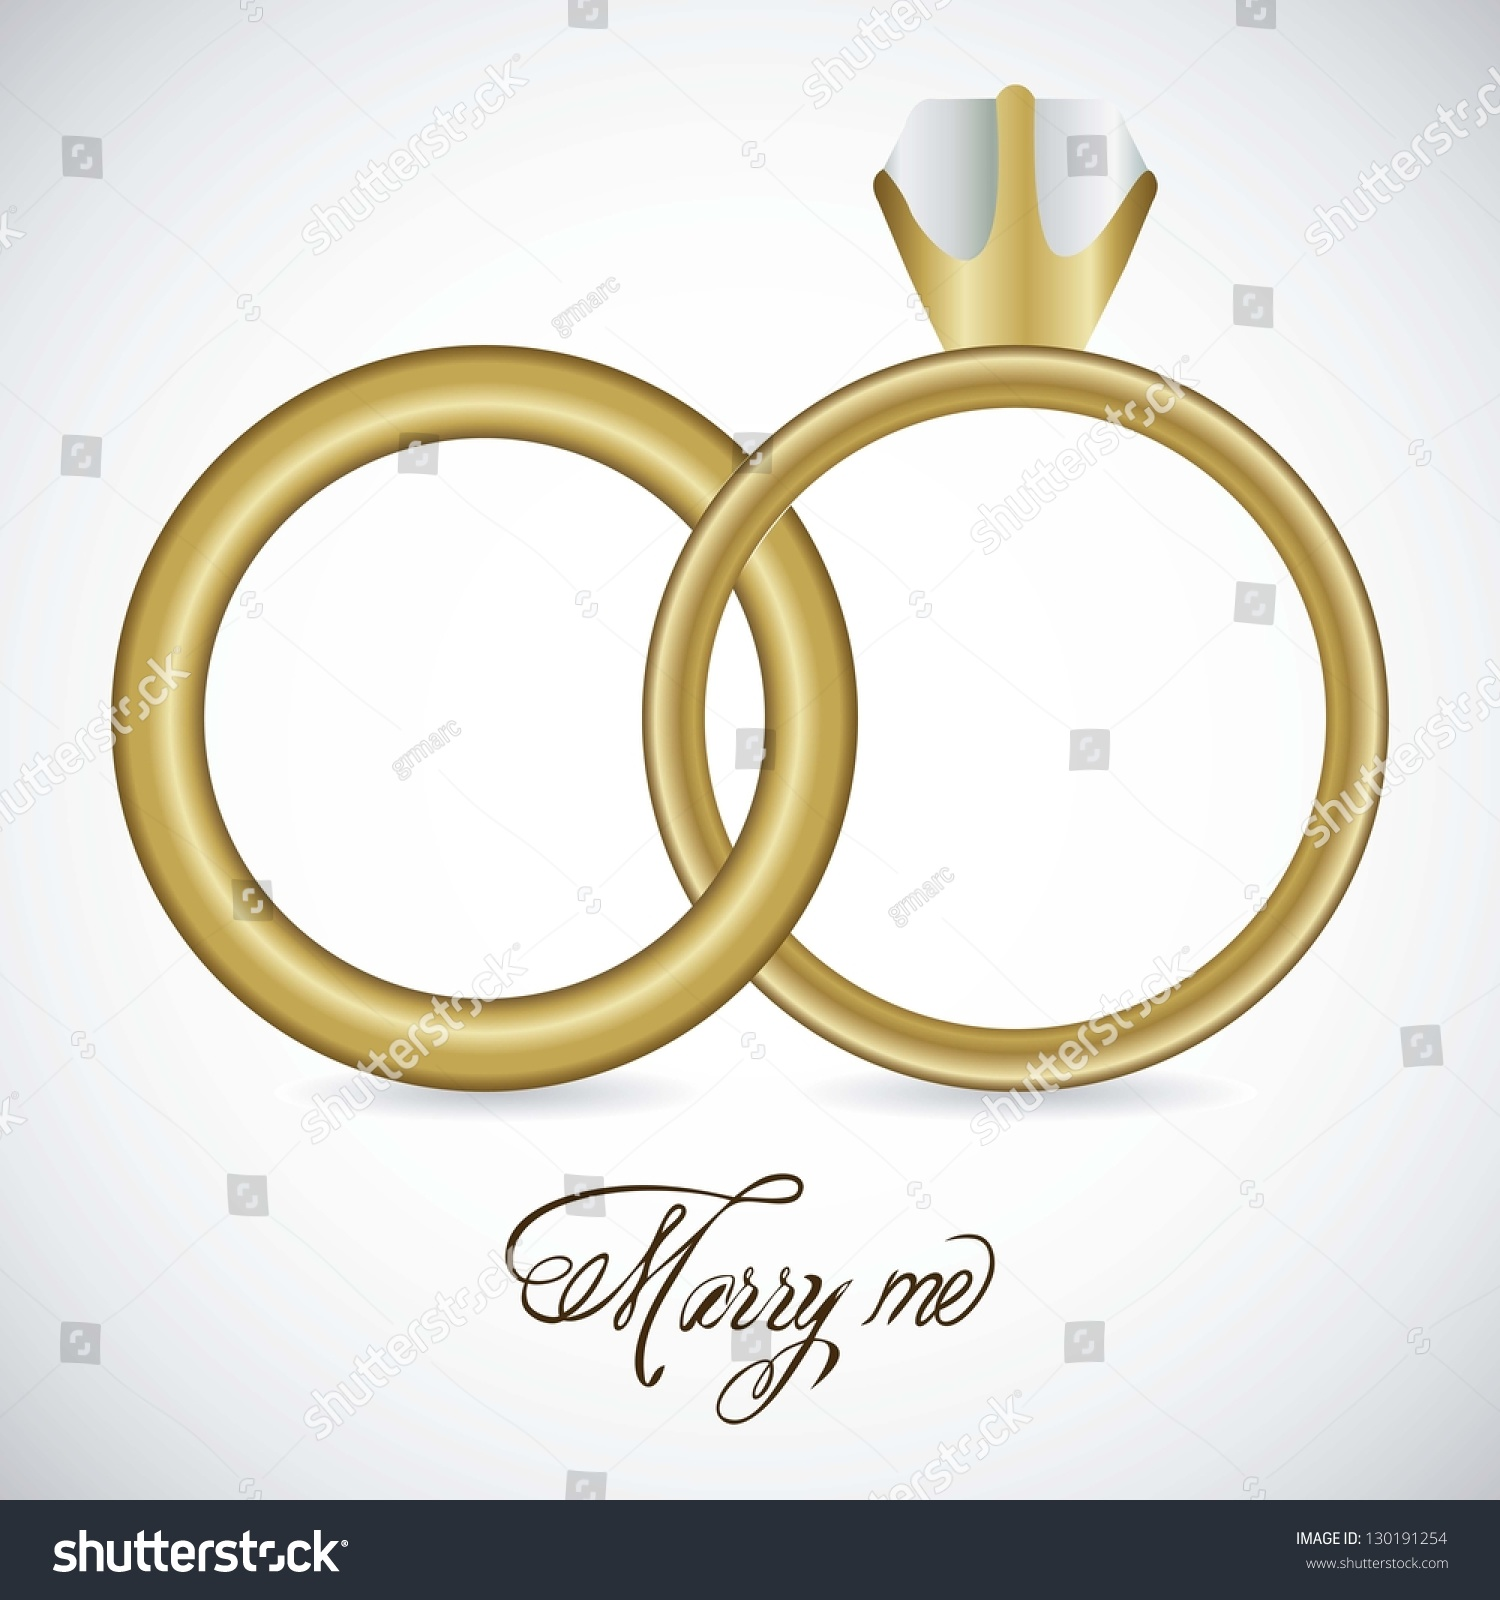 Illustration Wedding Icons Concepts Wedding Engagement